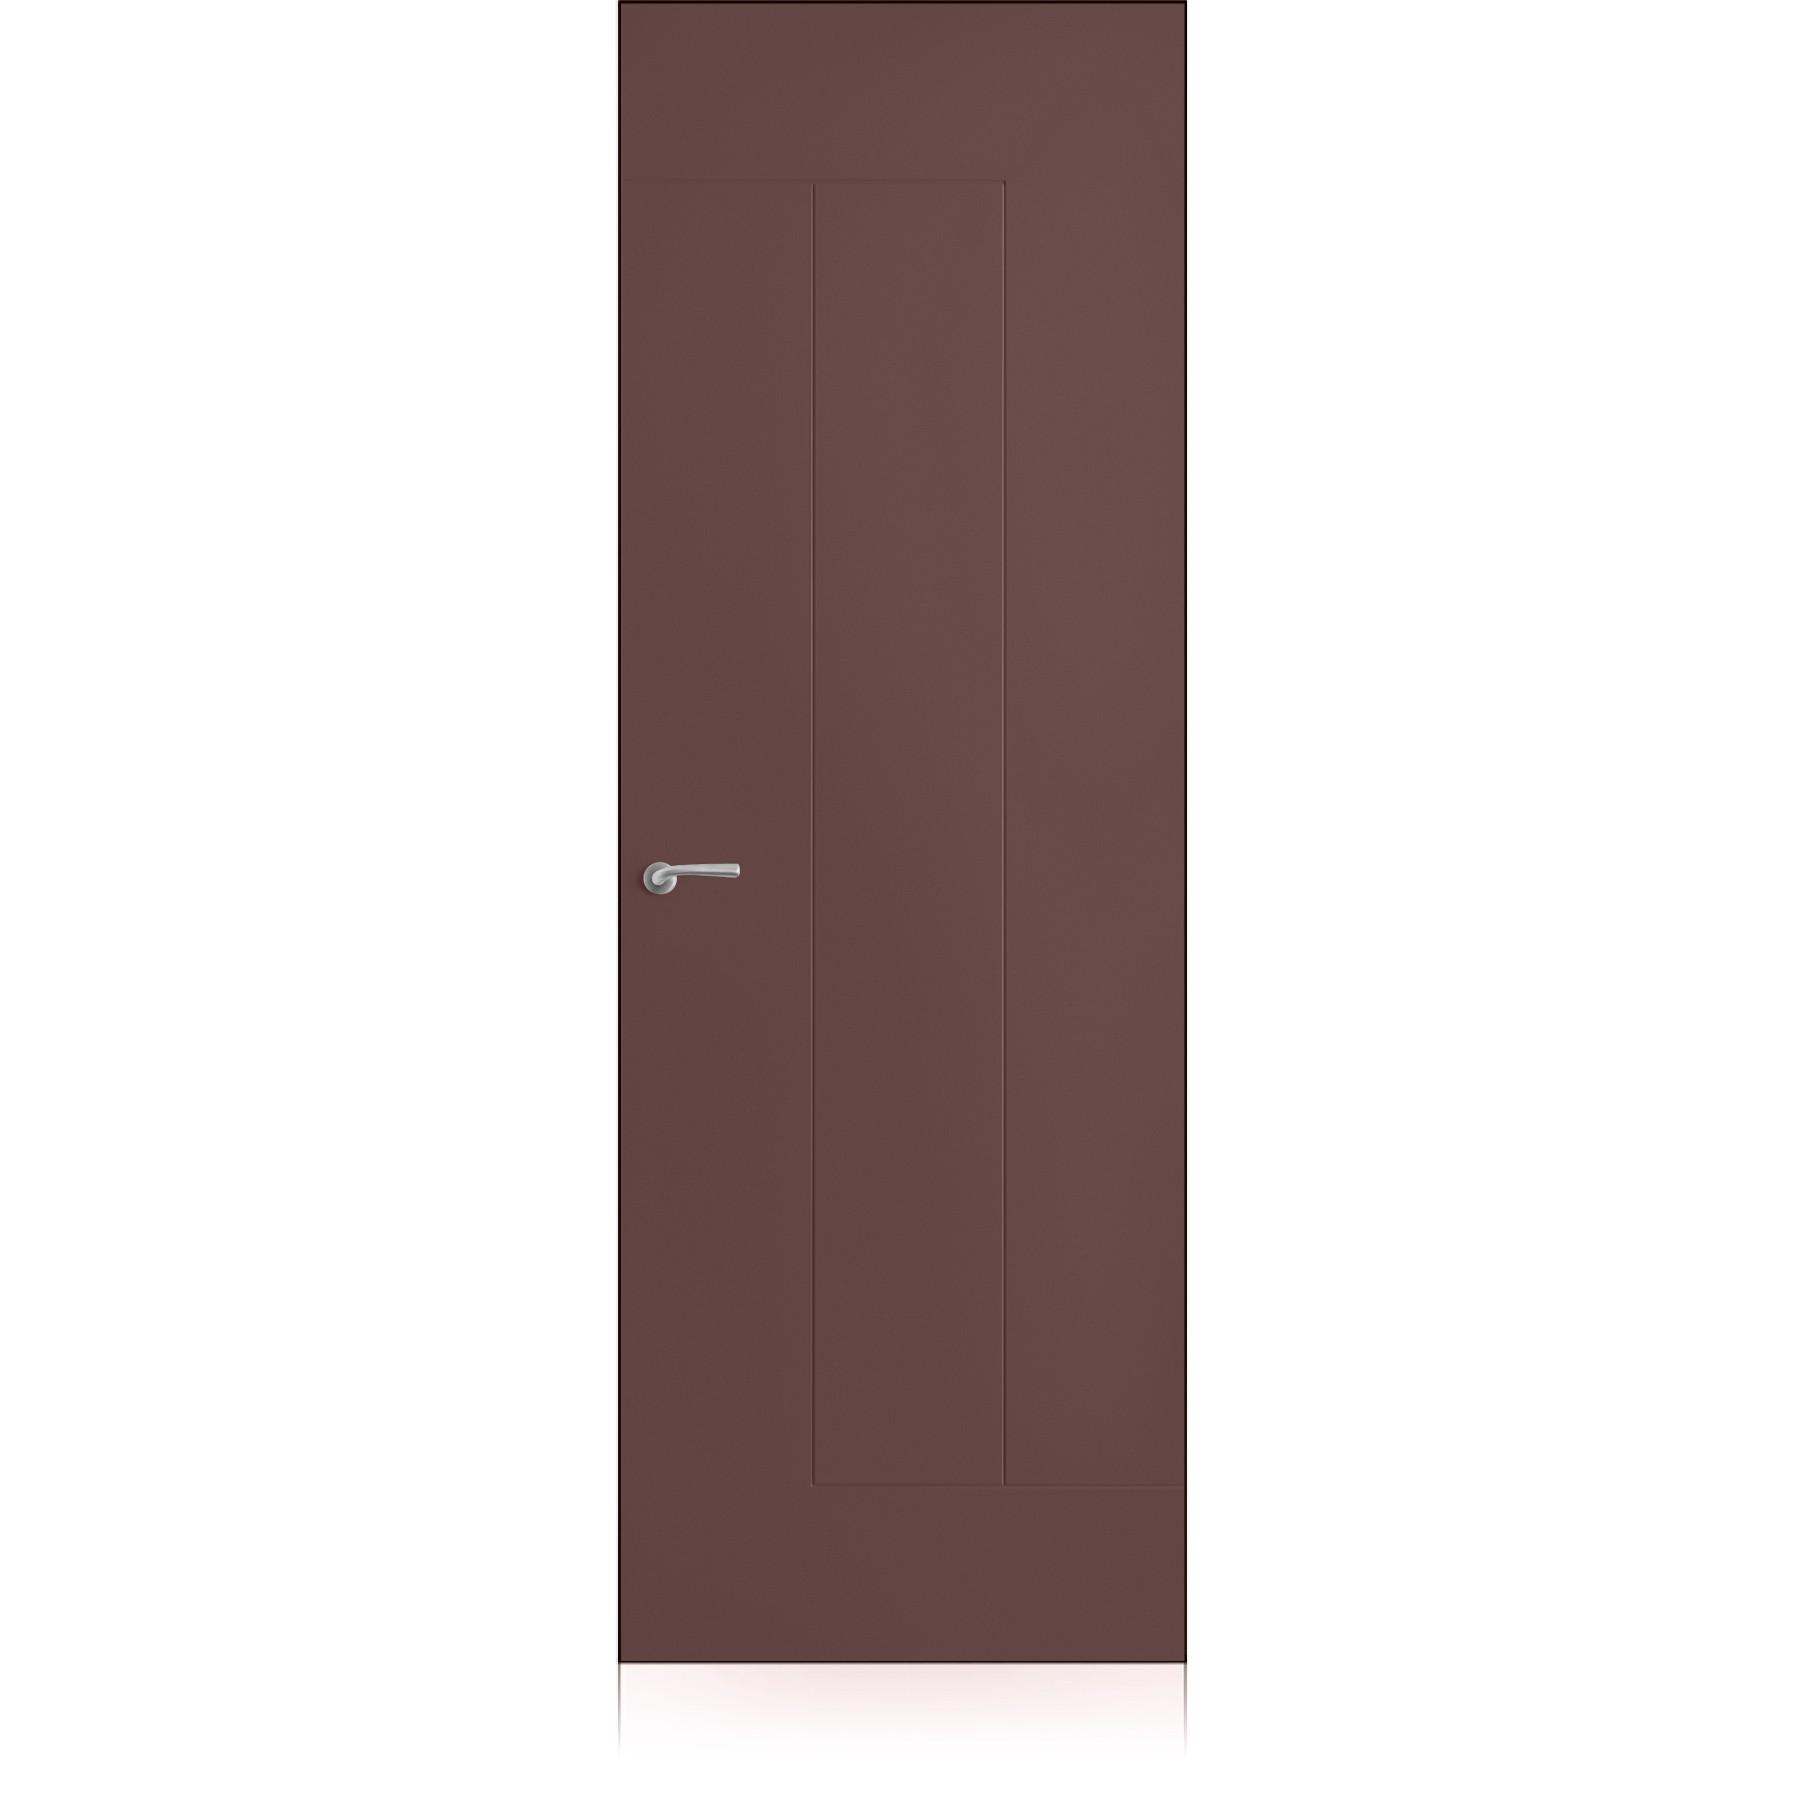 Yncisa/8 Zero Malva Pure Laccato ULTRAopaco door